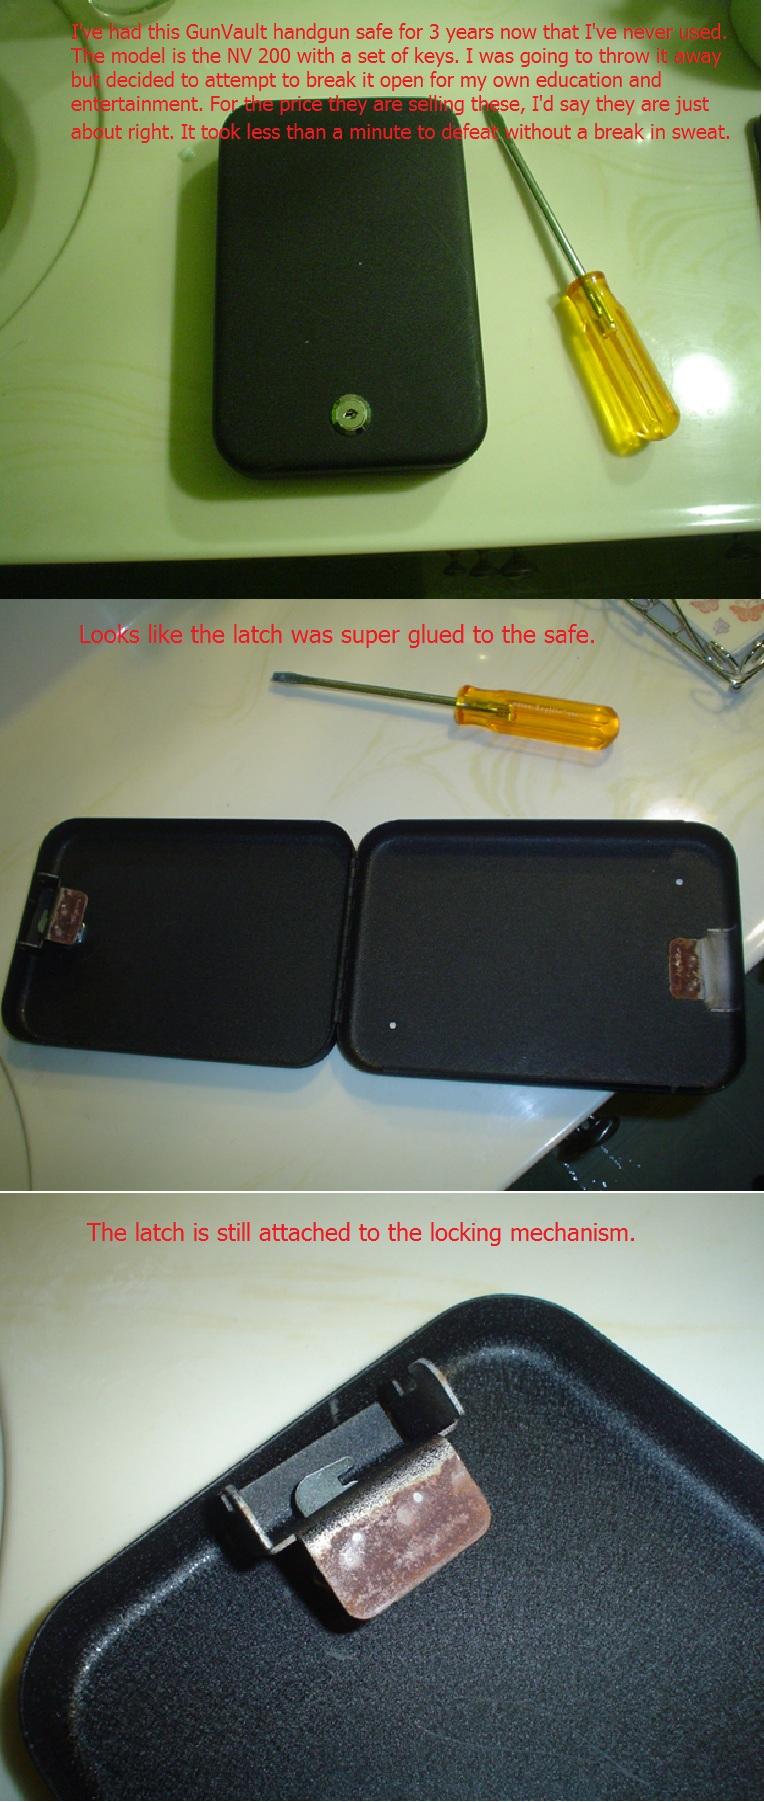 Locking gun in car/glove box-gv200-failed-latch-screwdriver.jpg